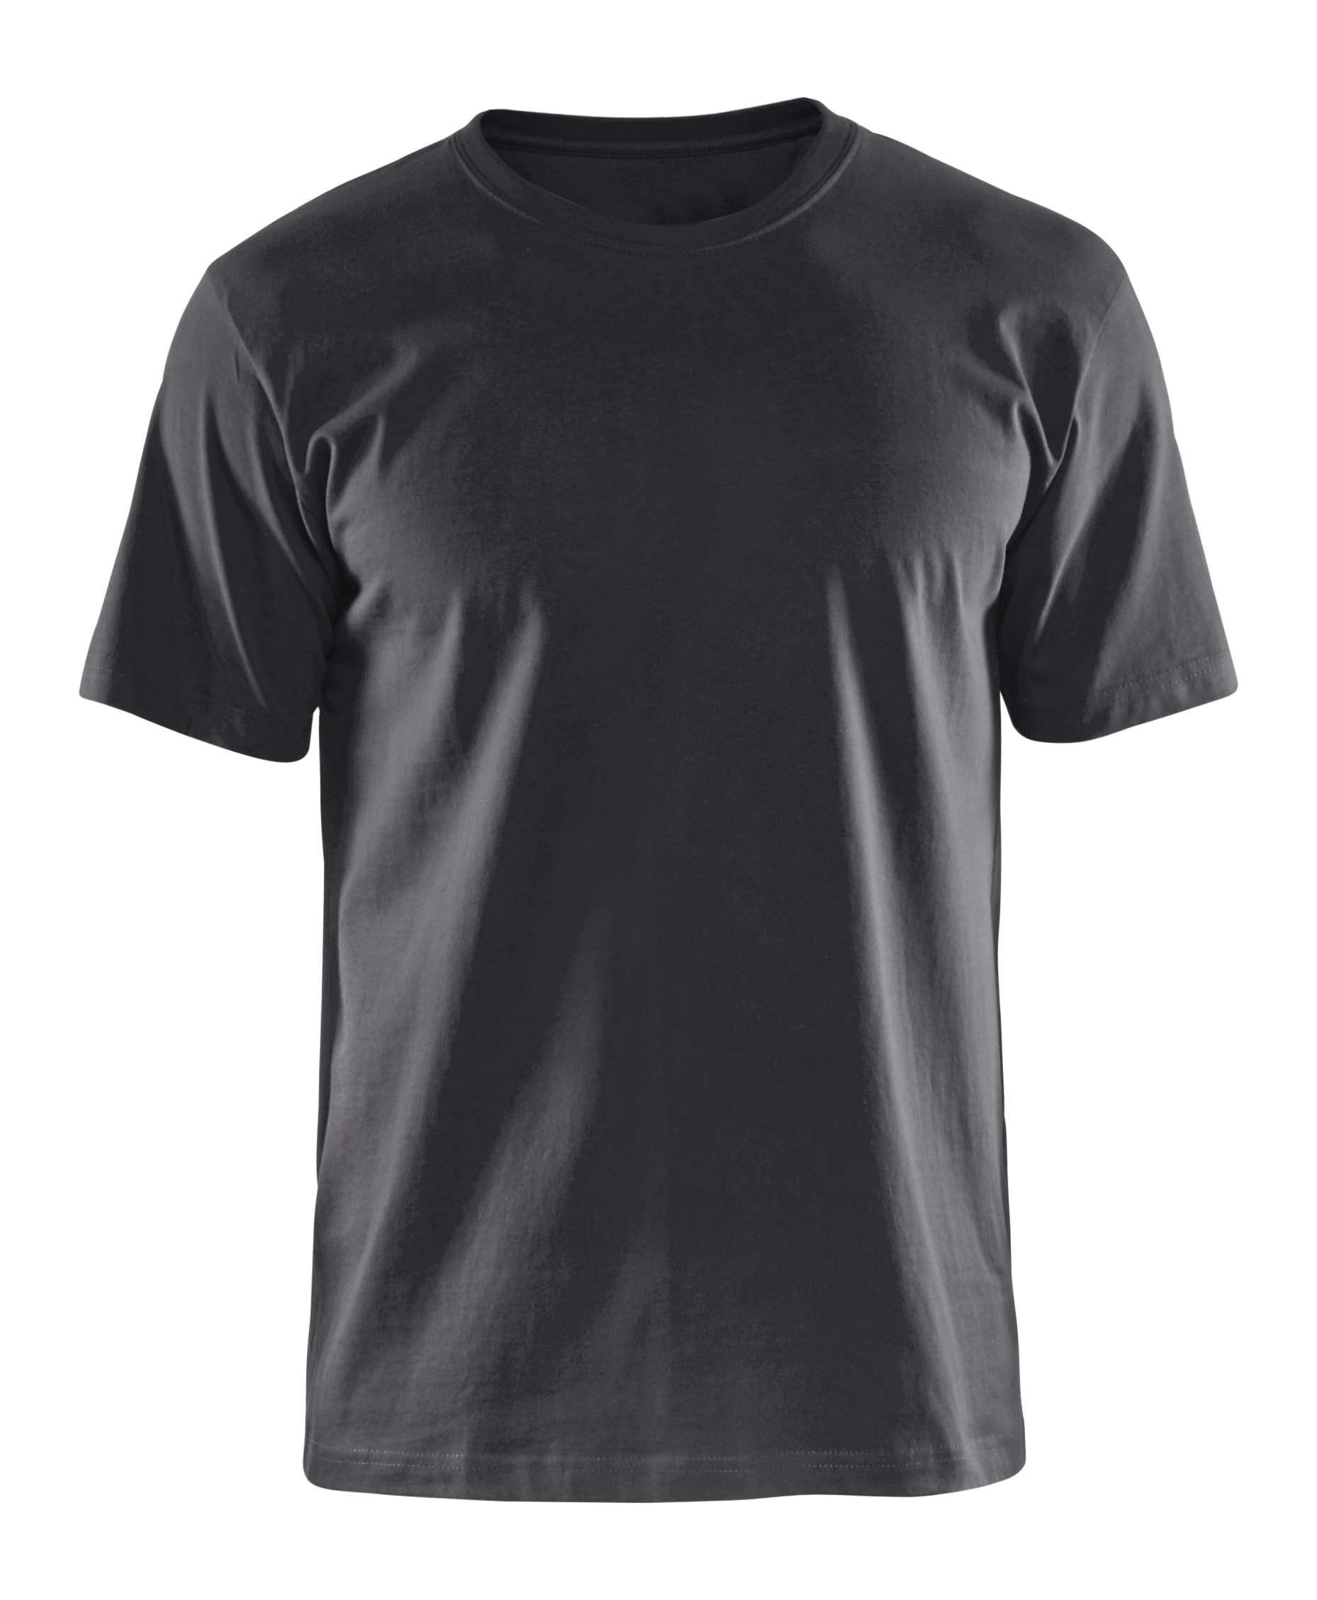 Blaklader T-shirts 35351063 midden grijs(9600)